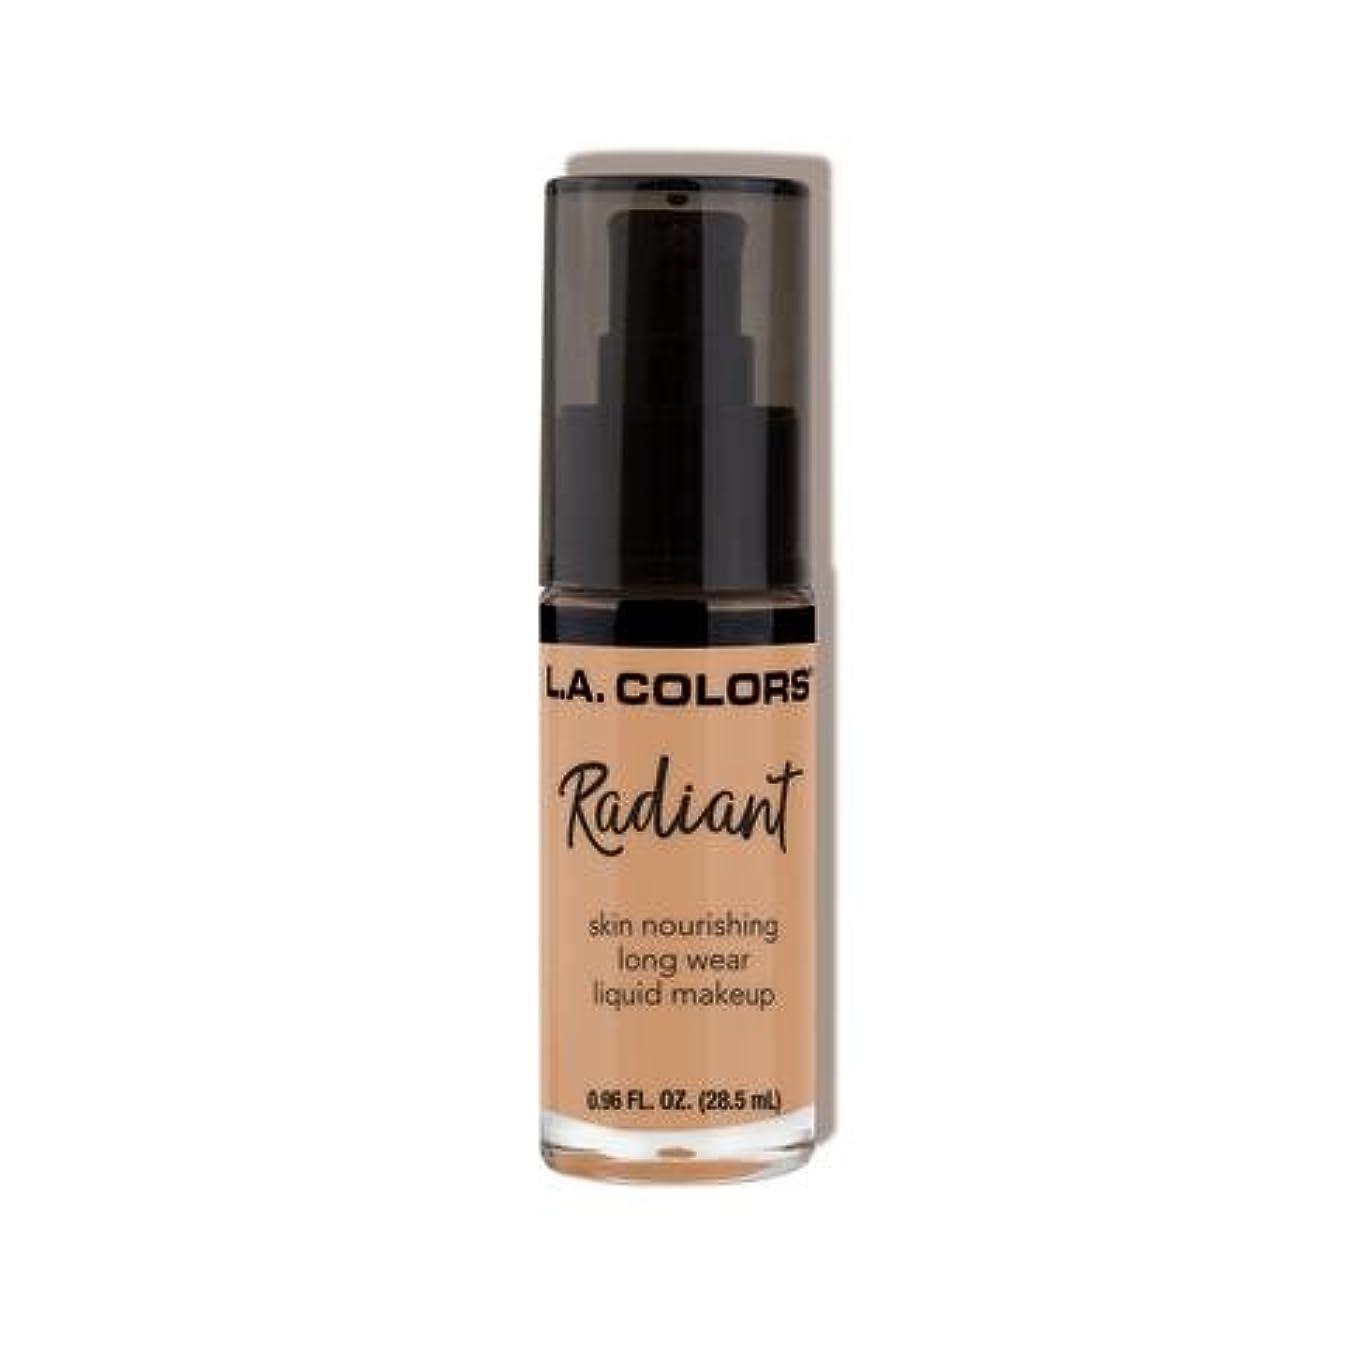 暫定過剰資料(3 Pack) L.A. COLORS Radiant Liquid Makeup - Light Tan (並行輸入品)